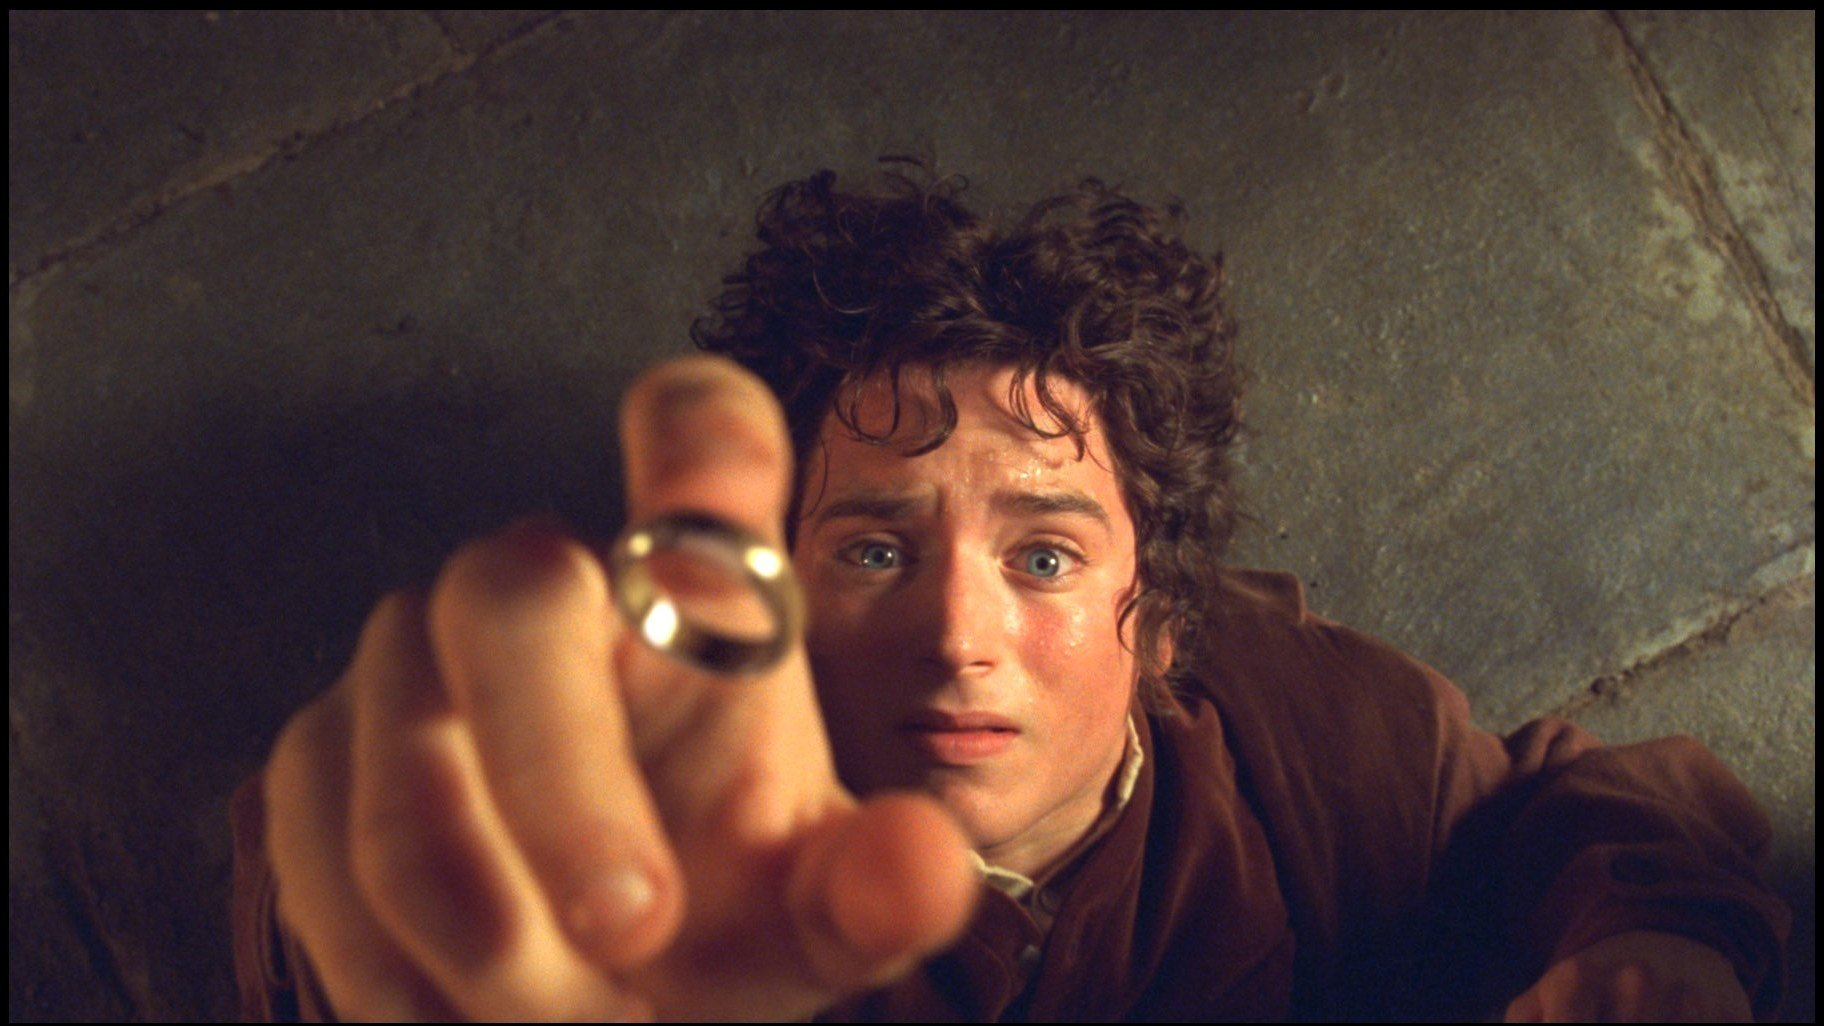 Amazon is making a 'Lord of the Rings' TV series https://t.co/Kc7gRVdqBI https://t.co/YA52EsMiB7